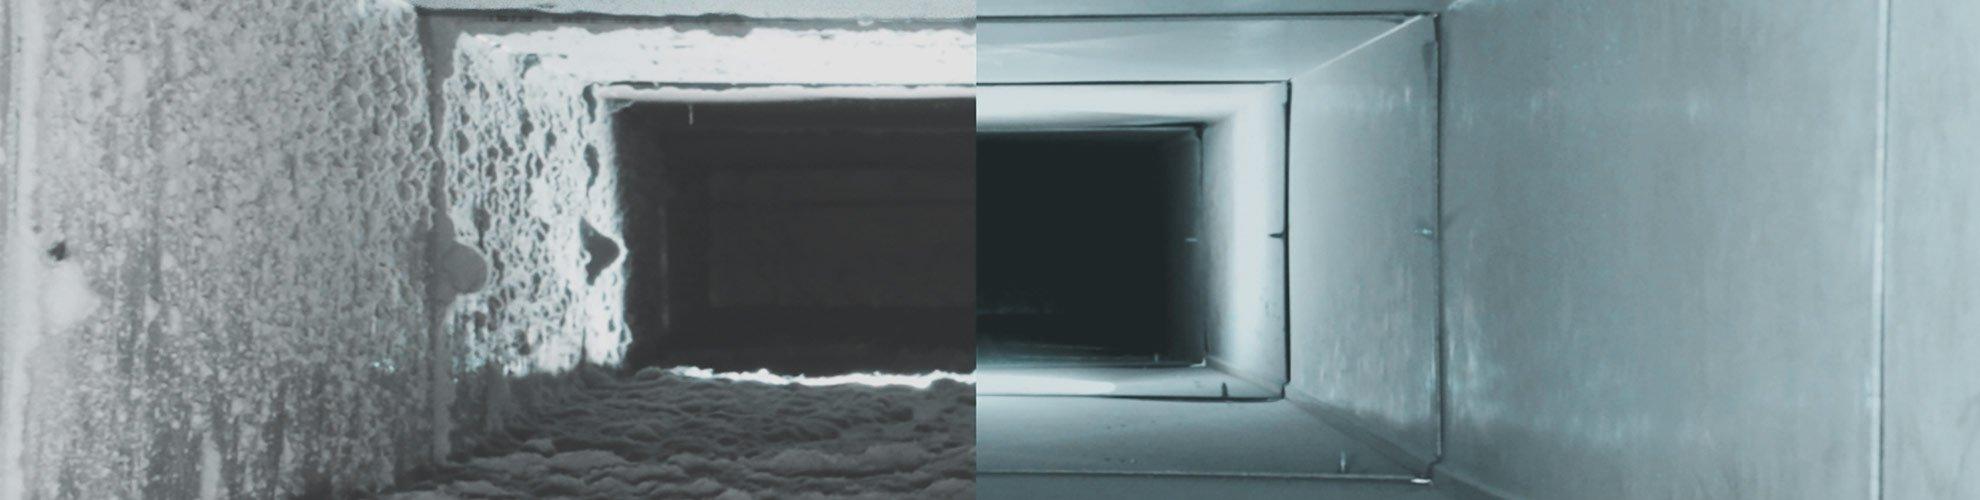 Услуга Чистка вентиляции в многоквартирном доме